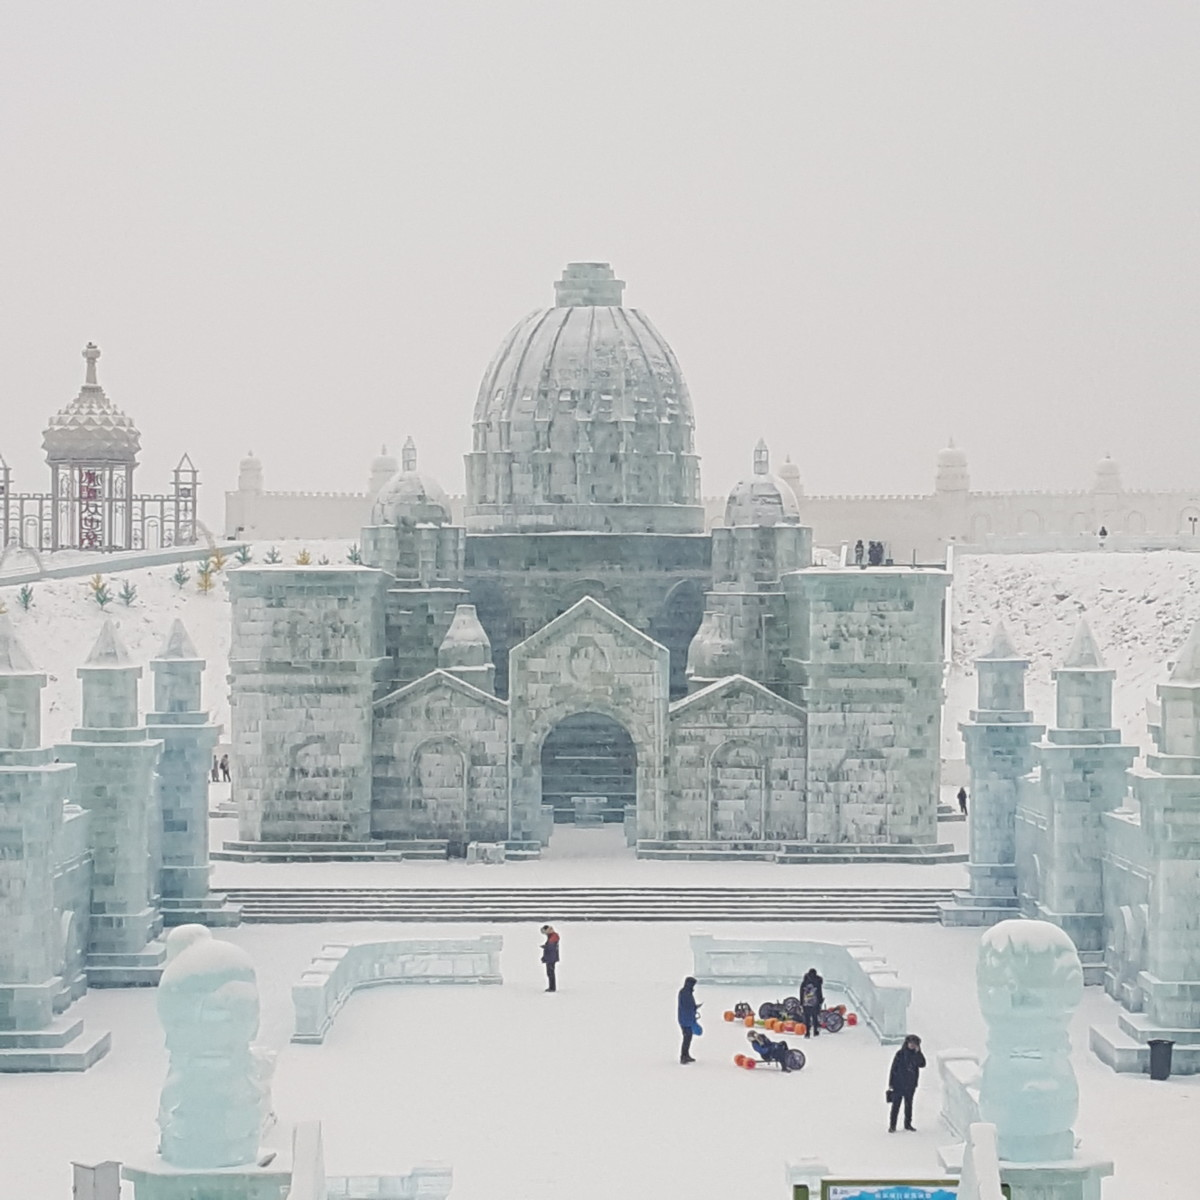 harbin-ice-festival-a-photo-gallery